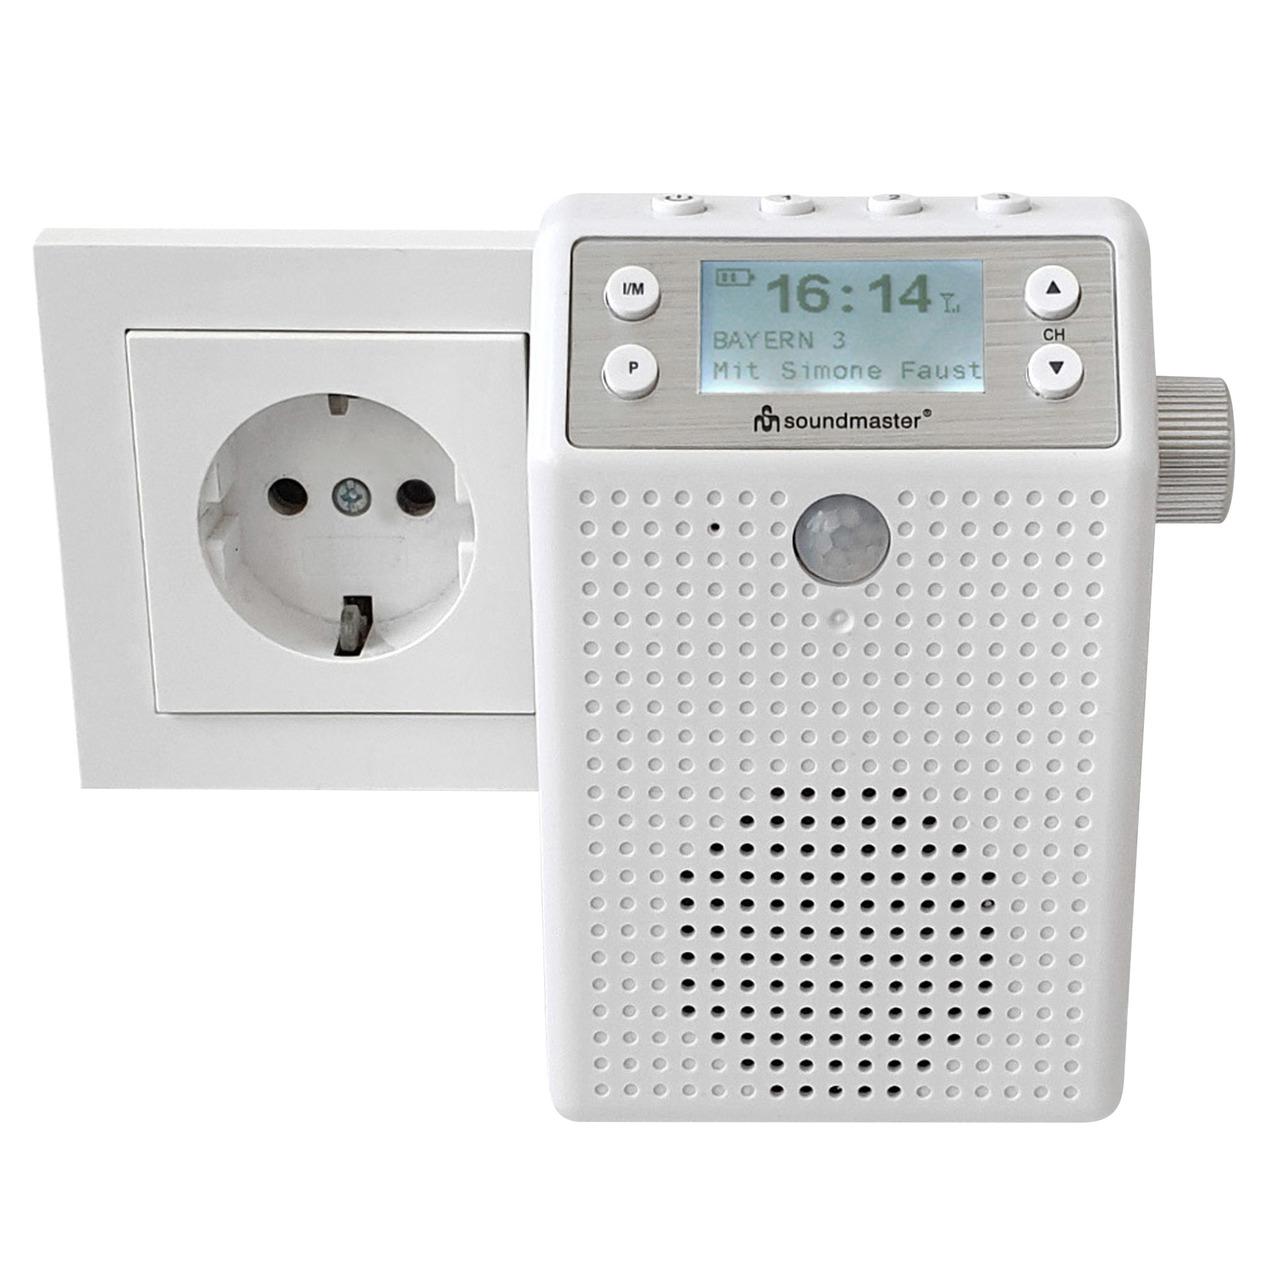 Soundmaster Aufputz-Steckdosenradio DAB60WE- DAB+-UKW- Bluetooth- Akku- IPX4